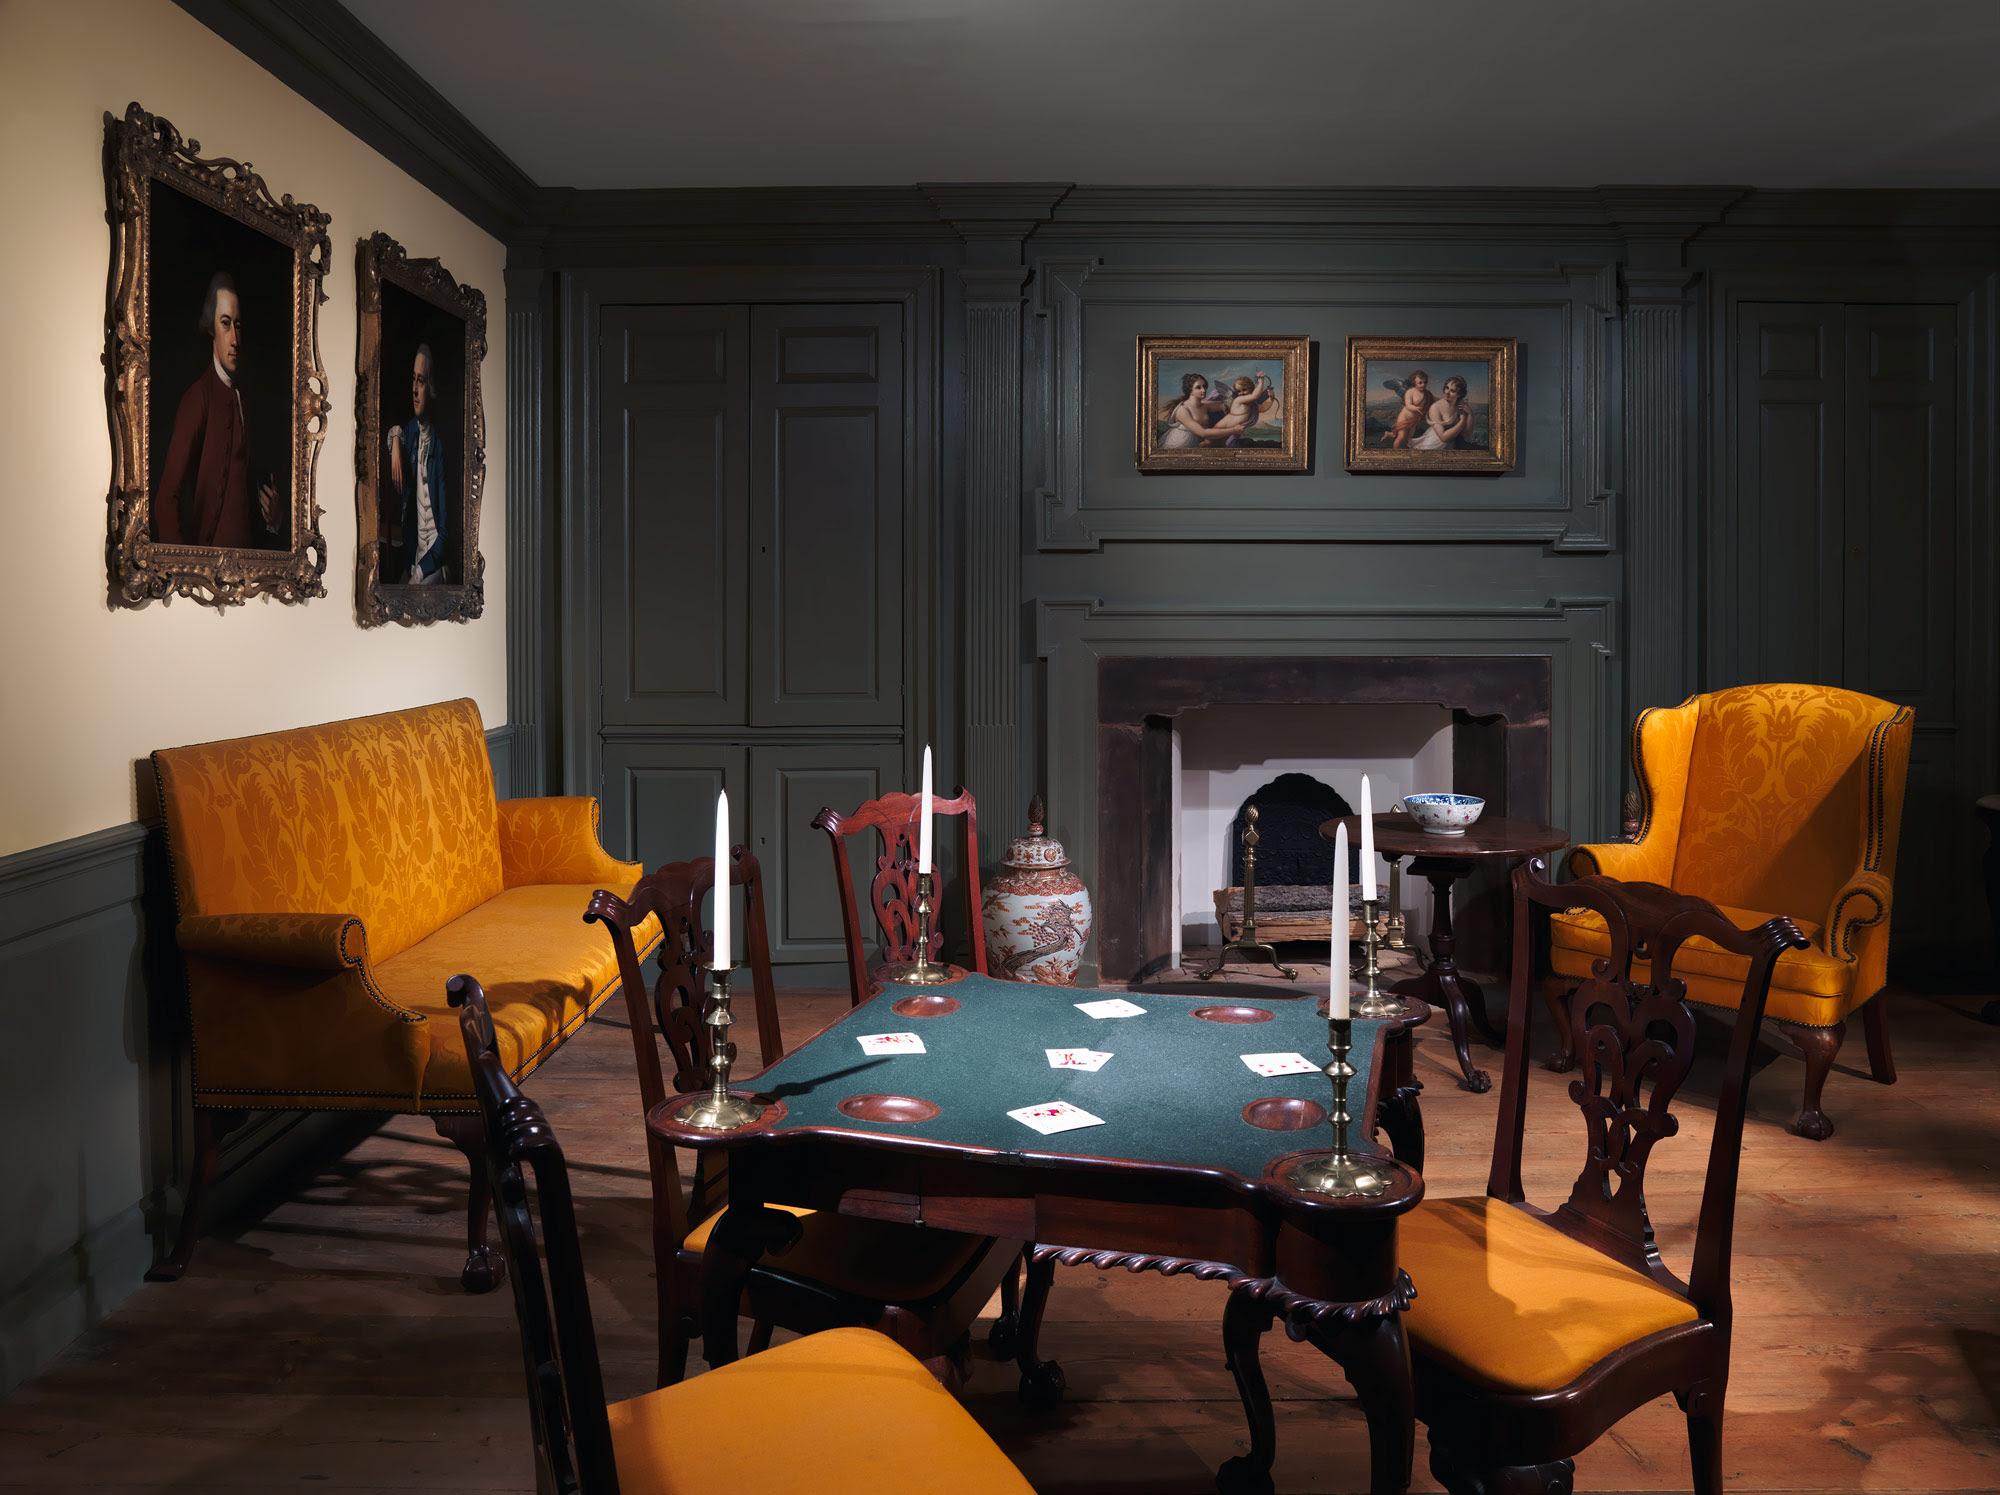 georgian house modern interior - Zion Star